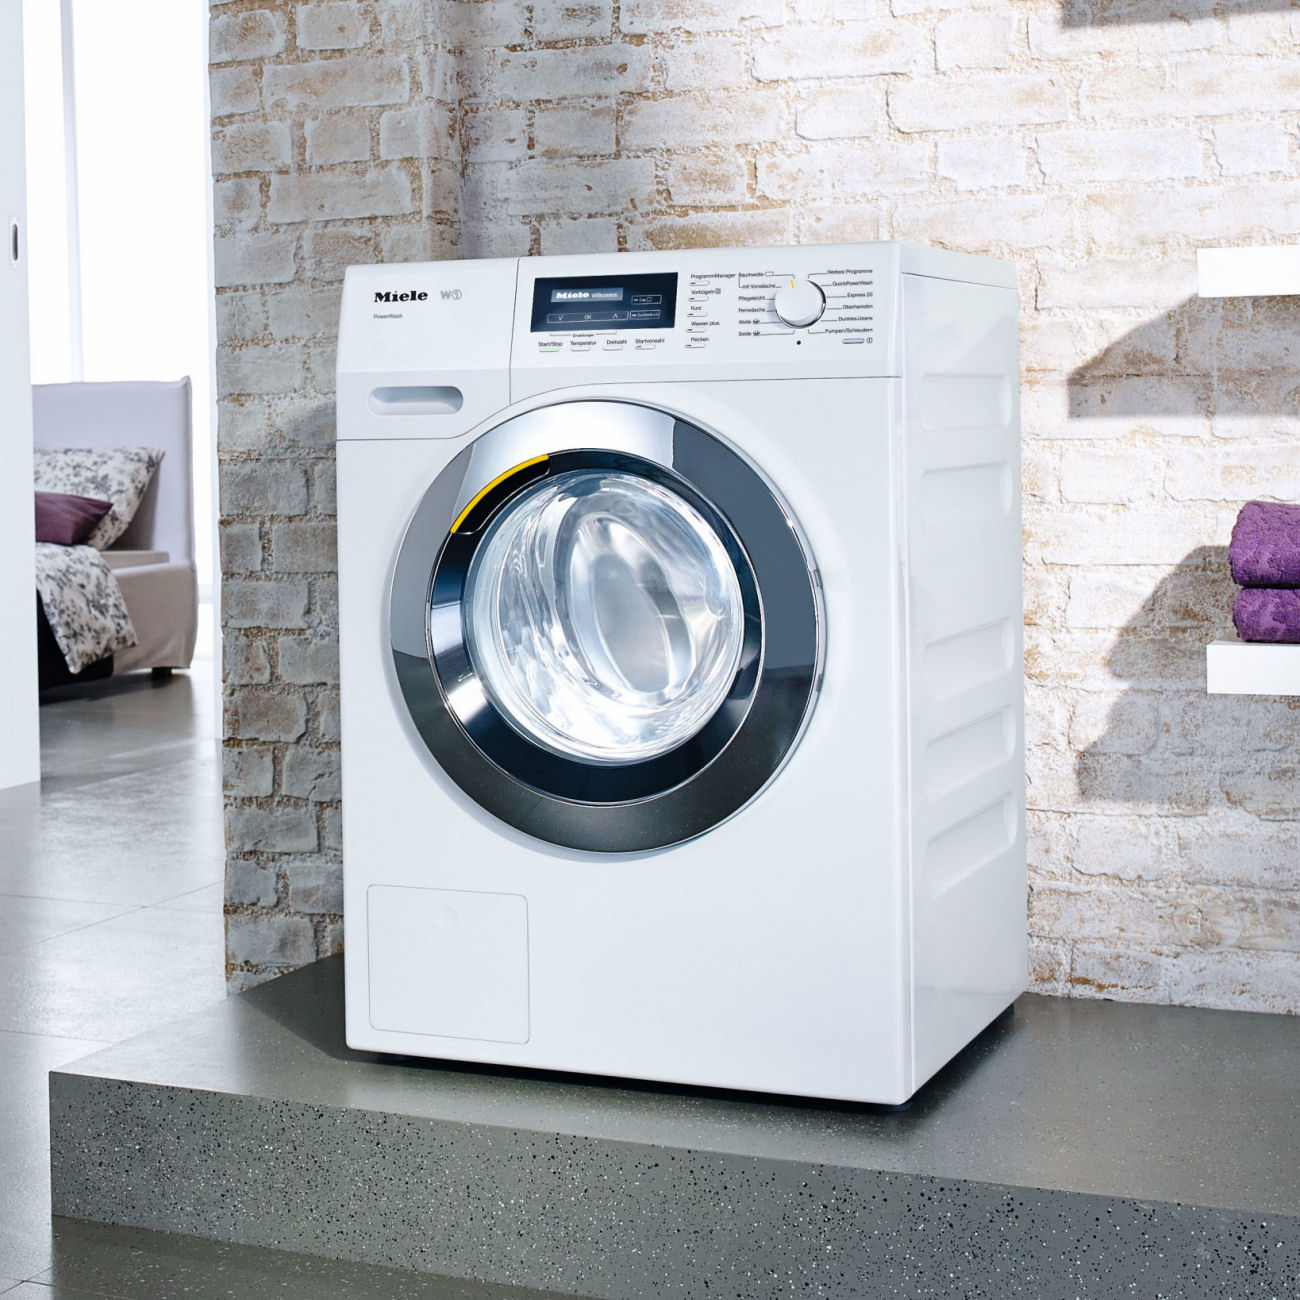 miele laundry appliances. Black Bedroom Furniture Sets. Home Design Ideas